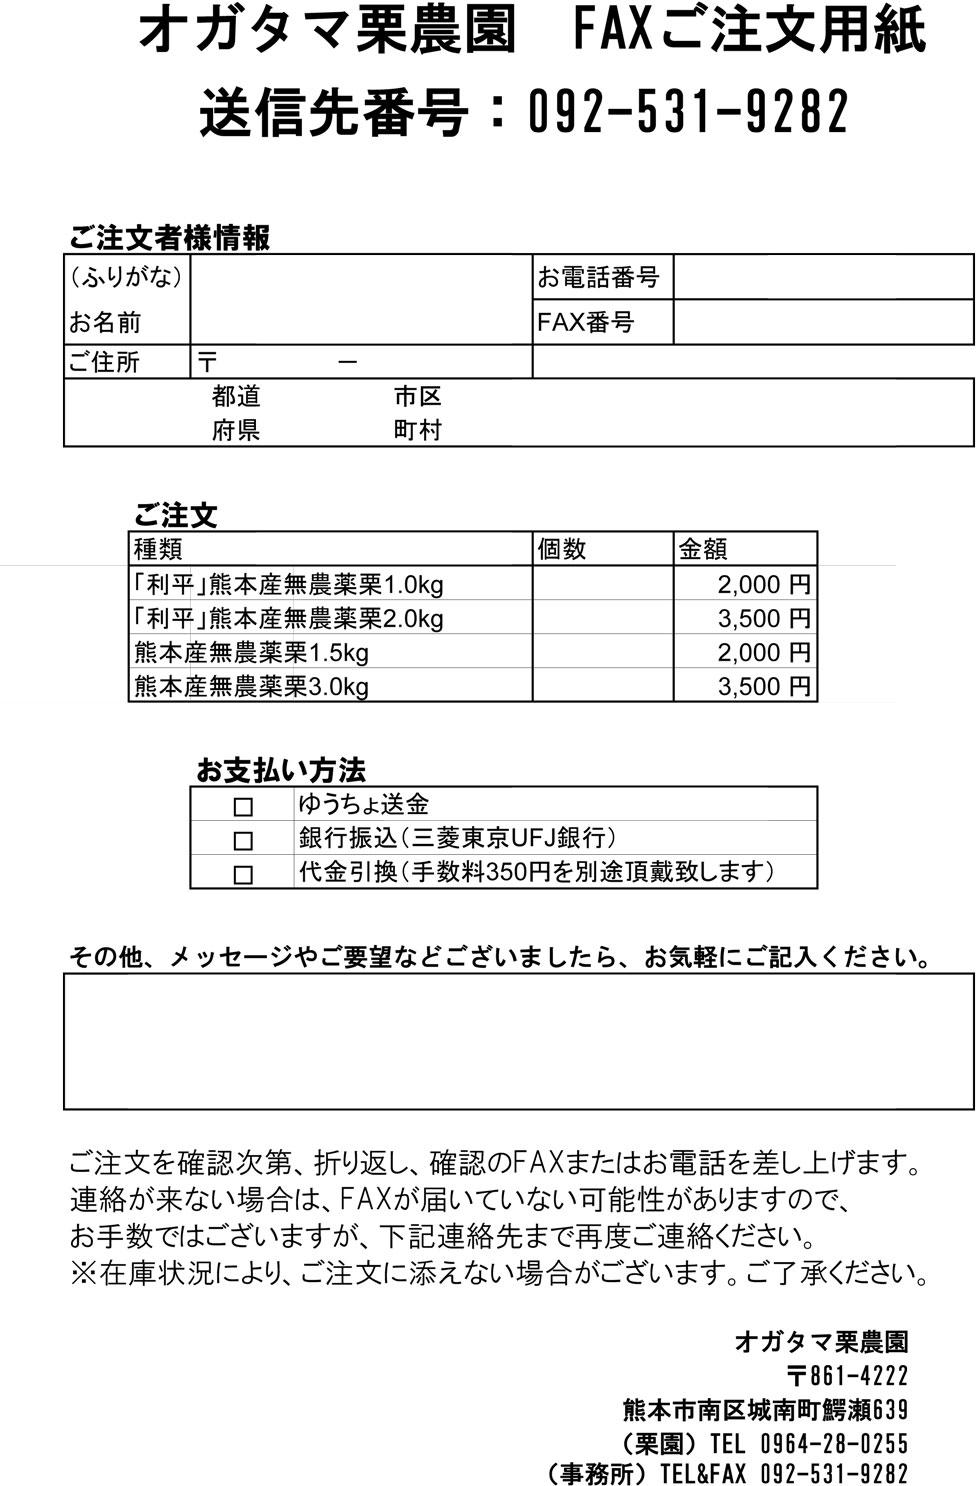 fax_2.jpg